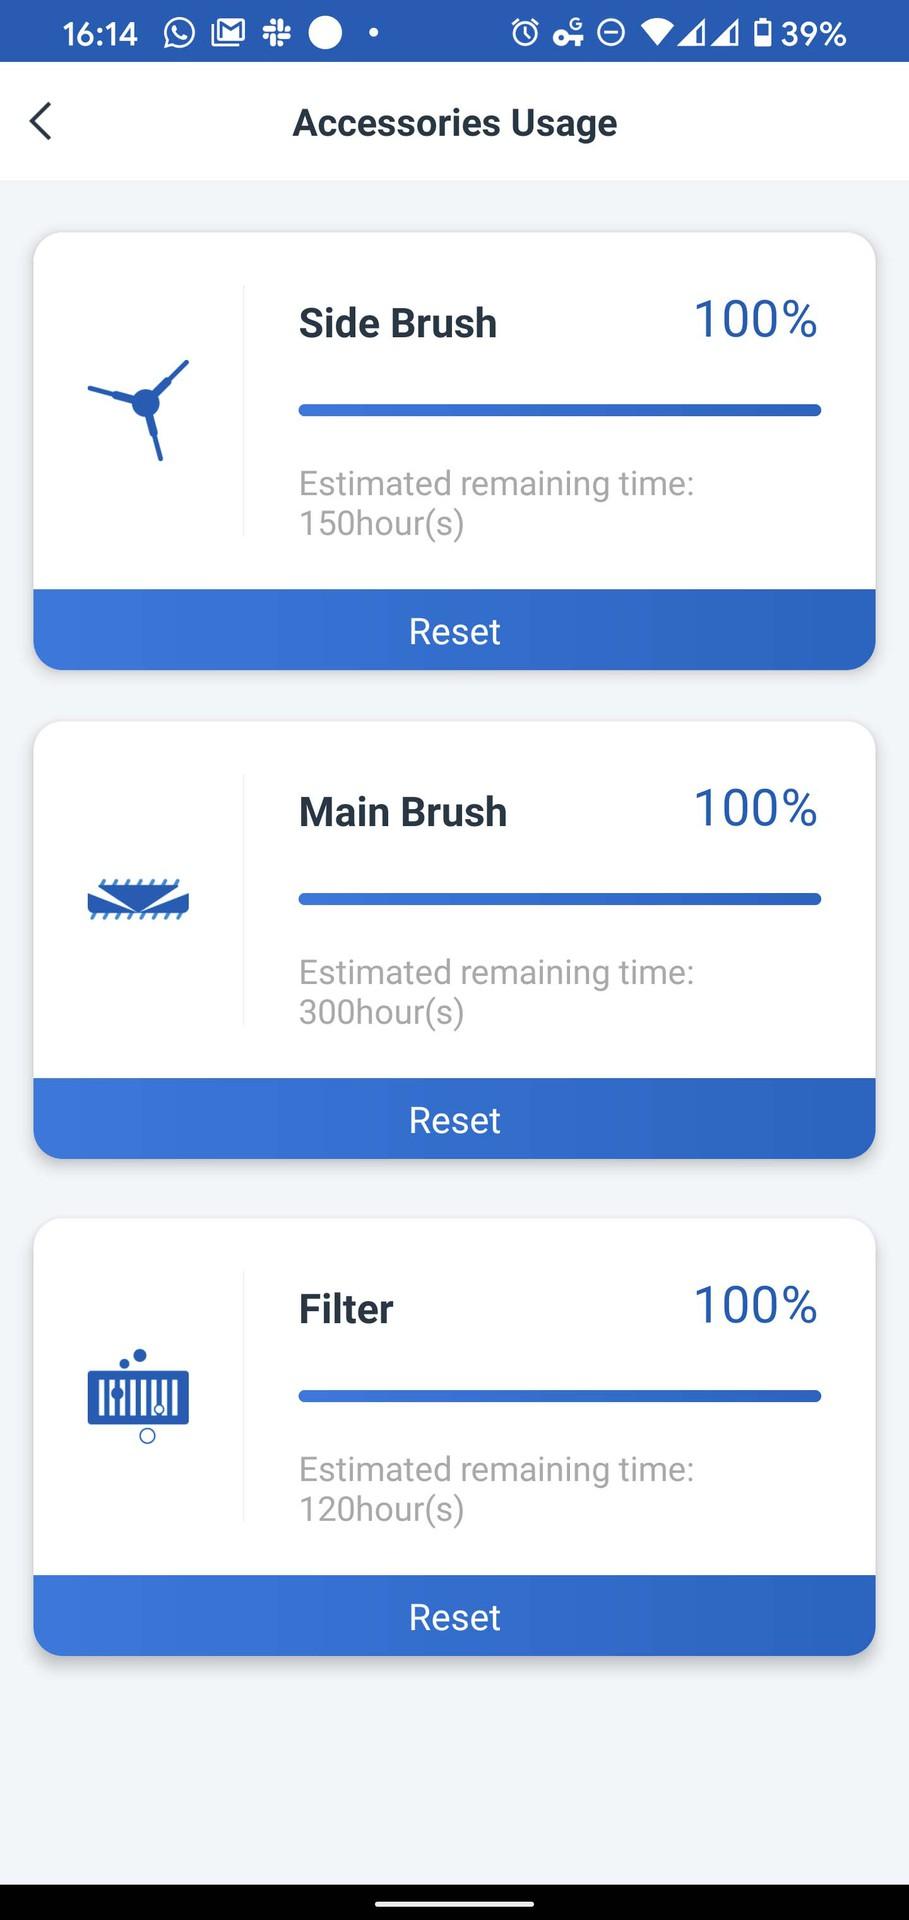 Ecovacs Home acccessories usage screenshot